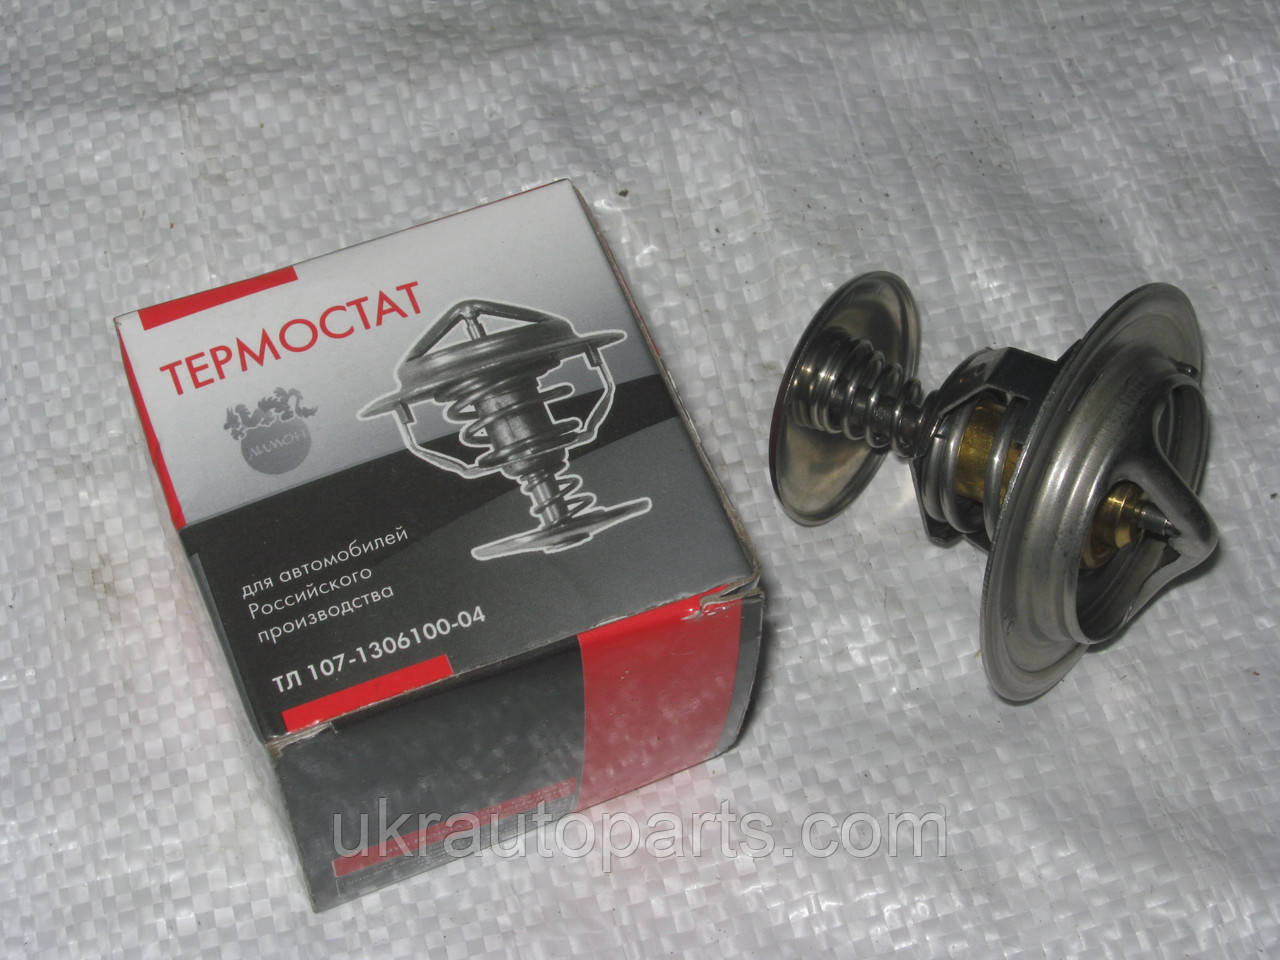 Термостат ГАЗ 33104 ВАЛДАЙ 3309 КАМАЗ МАЗ МТЗ ПАЗ (ТС107-04) (87С) (ТС107-1306100-04)